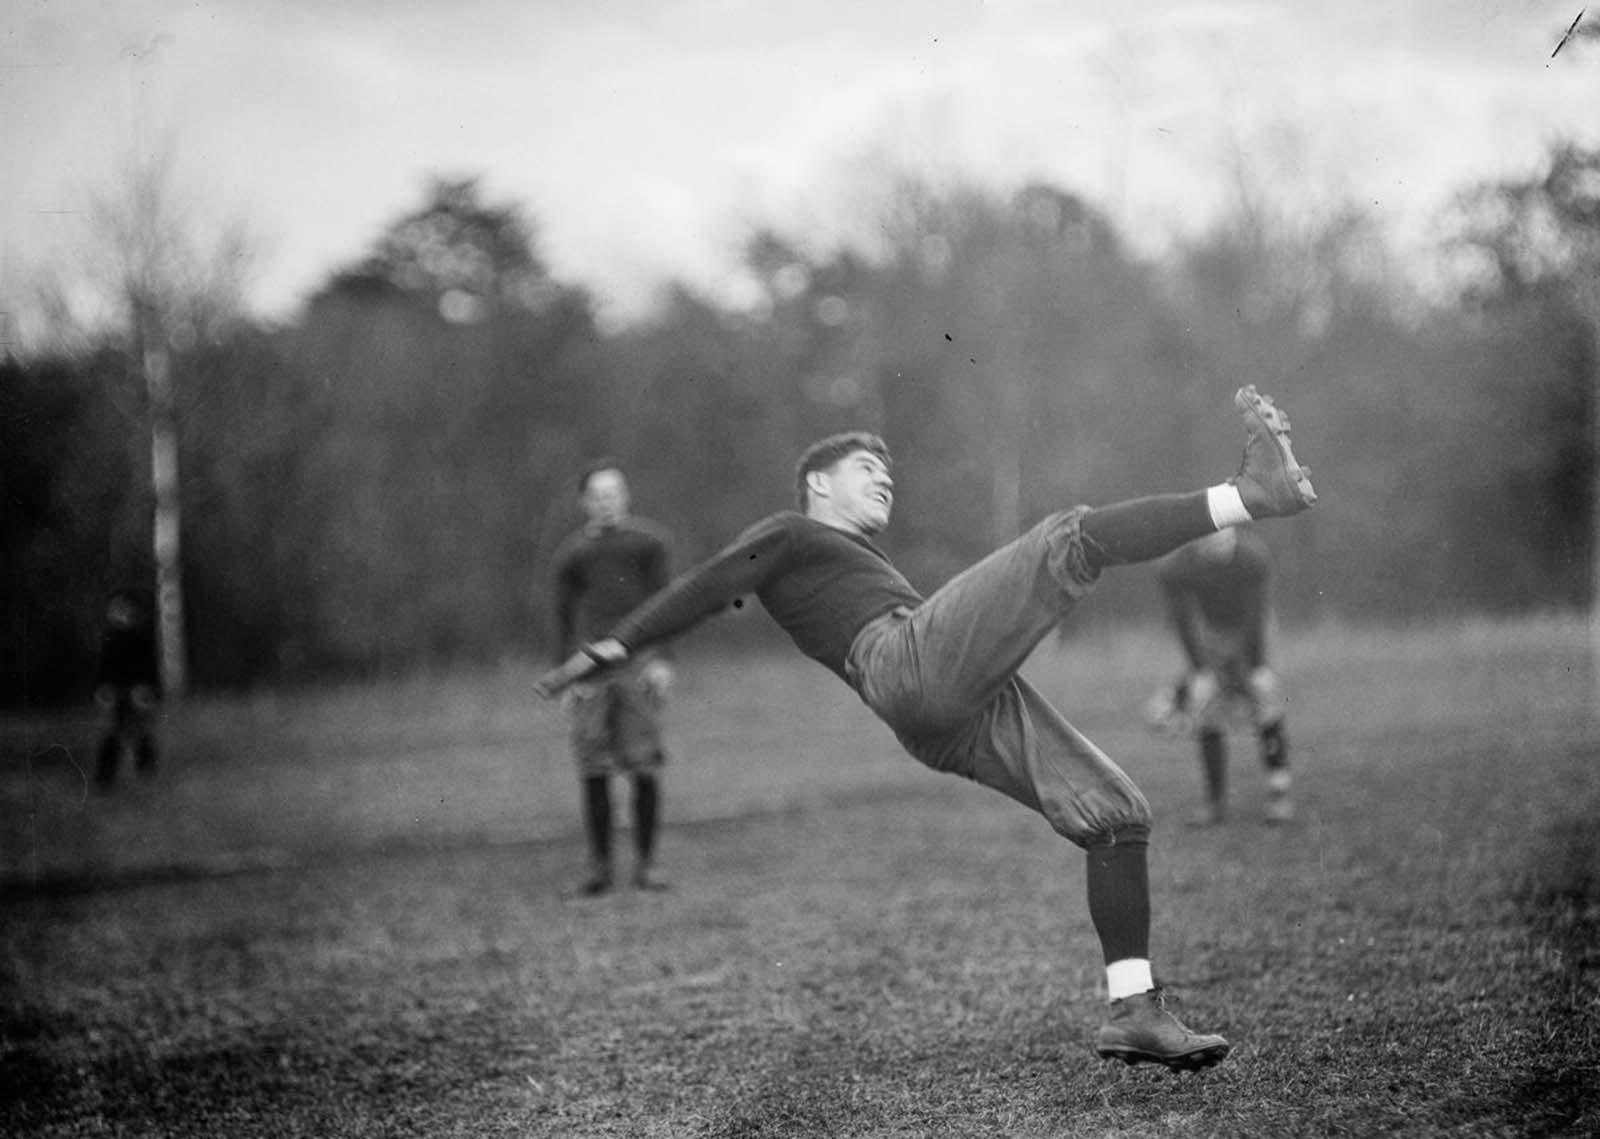 American football. 1912.